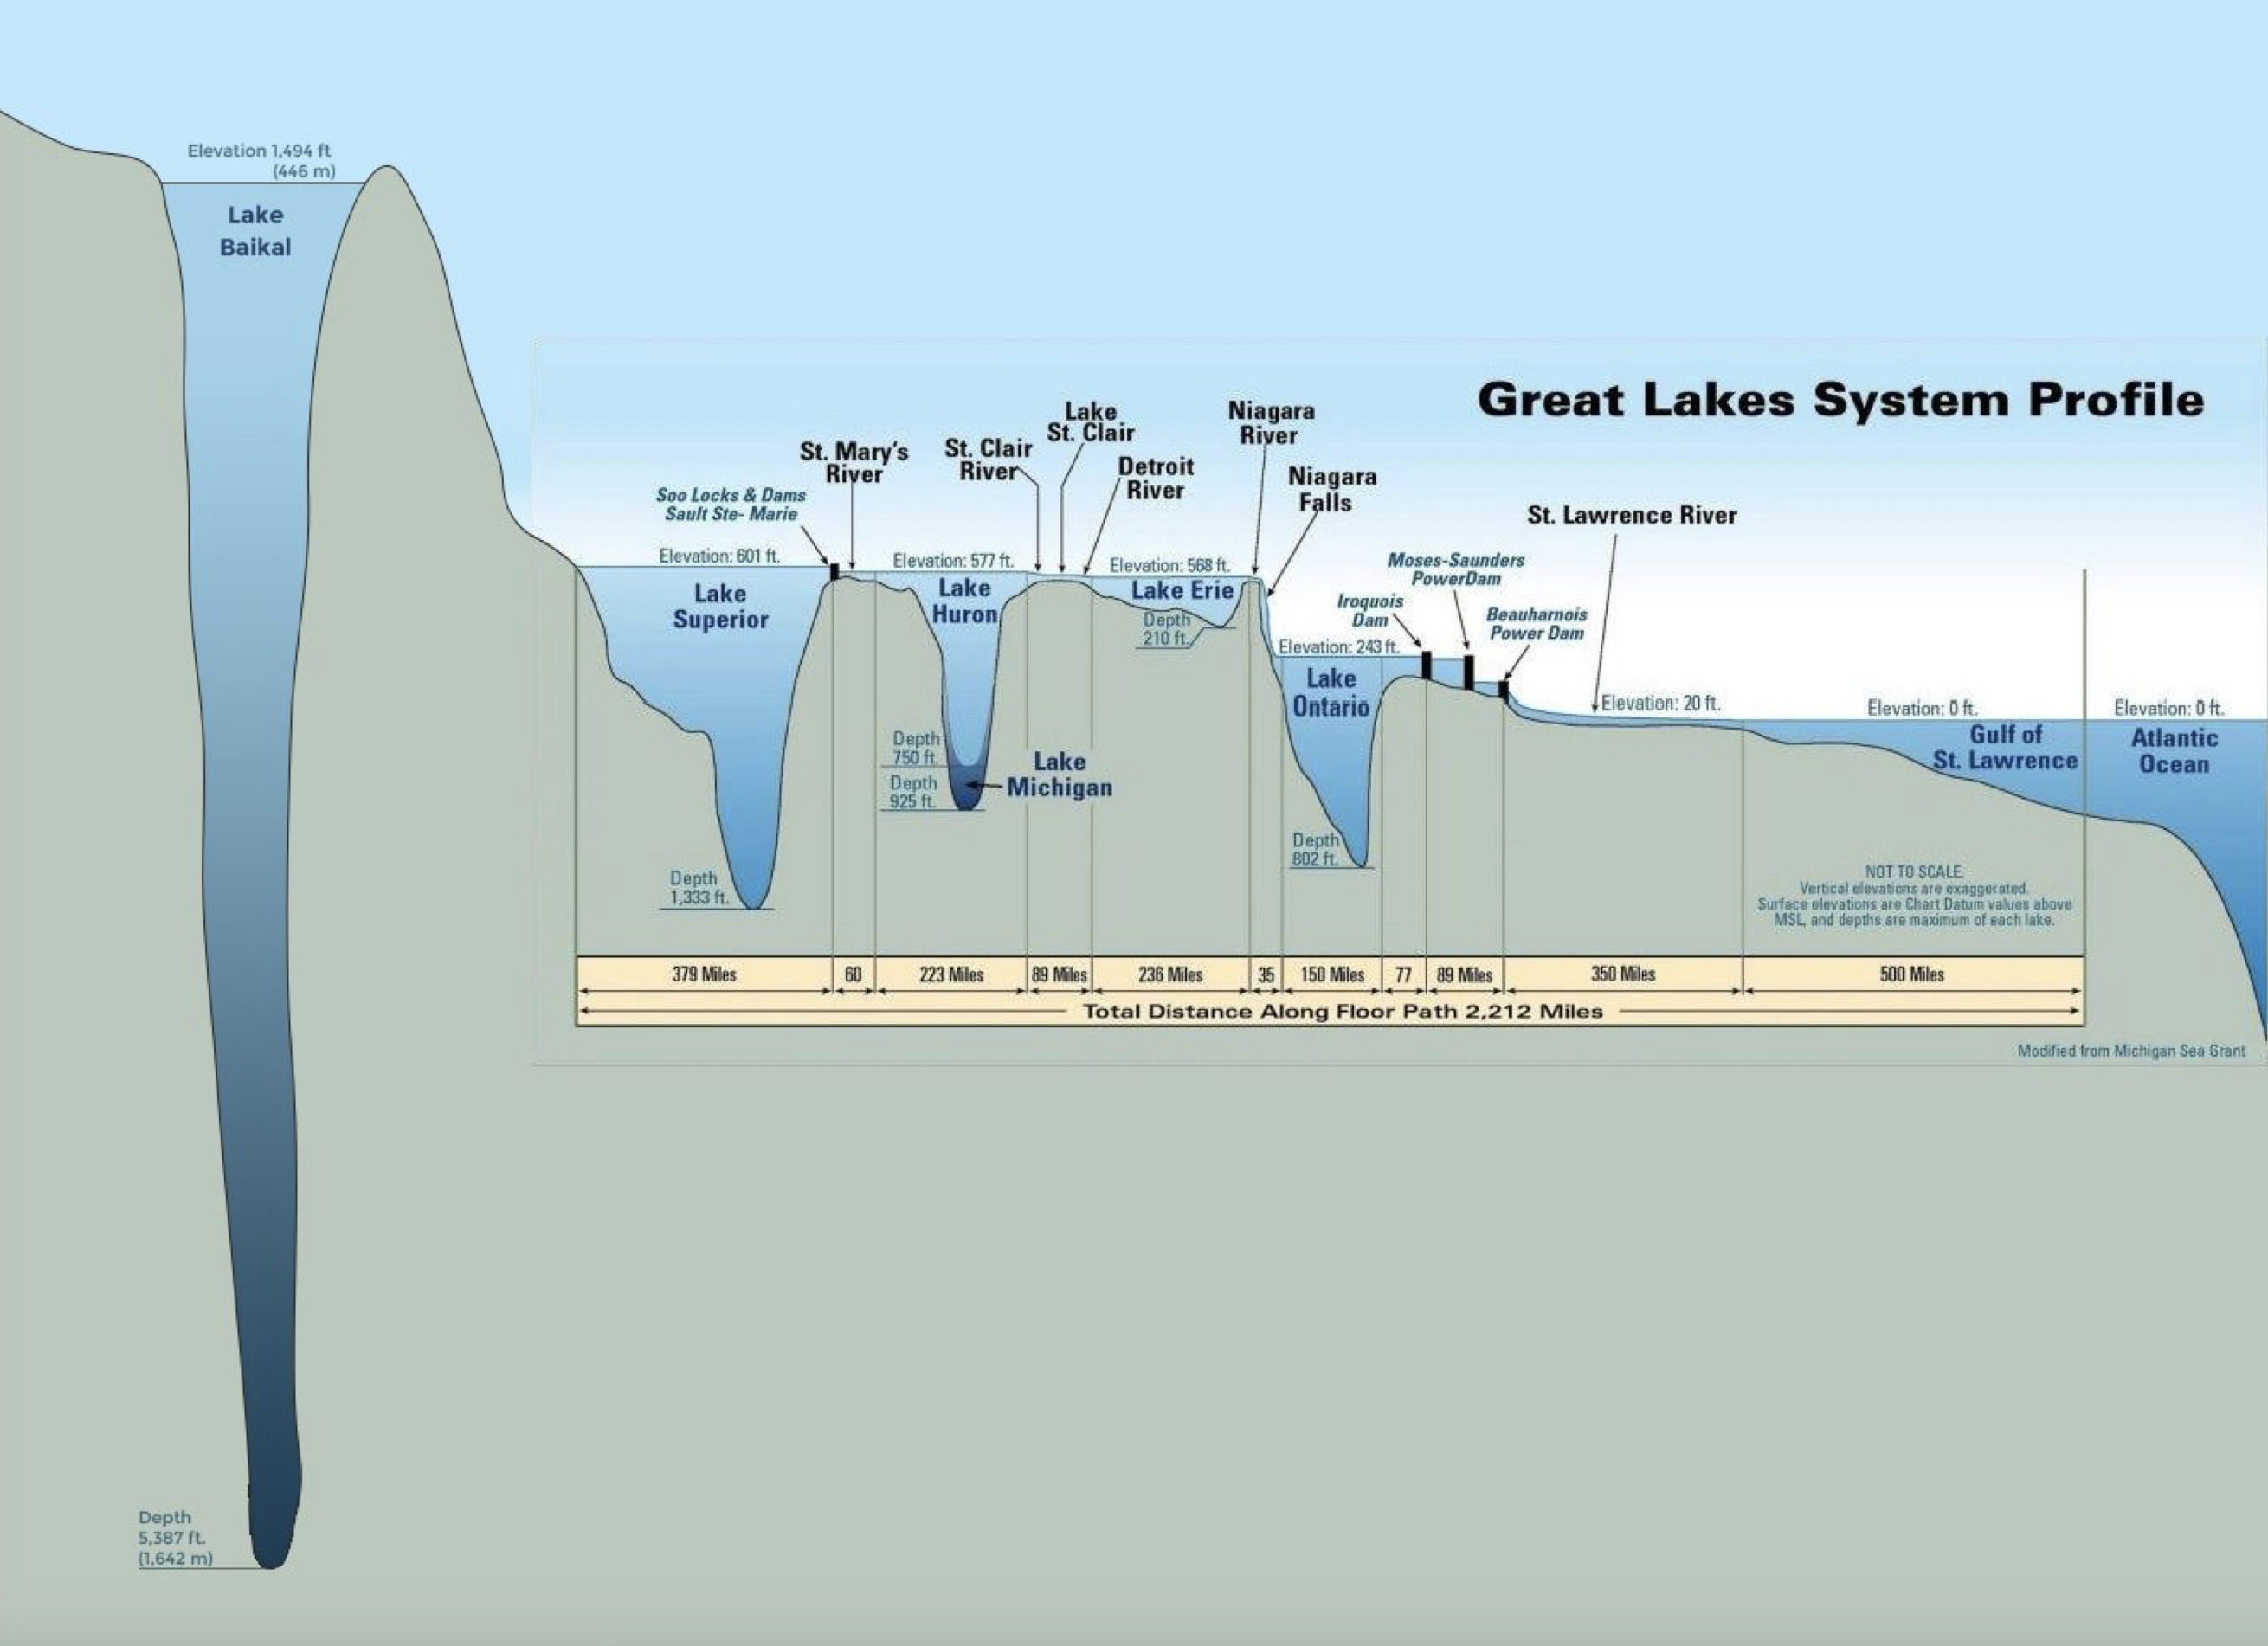 Great Lake System Profile